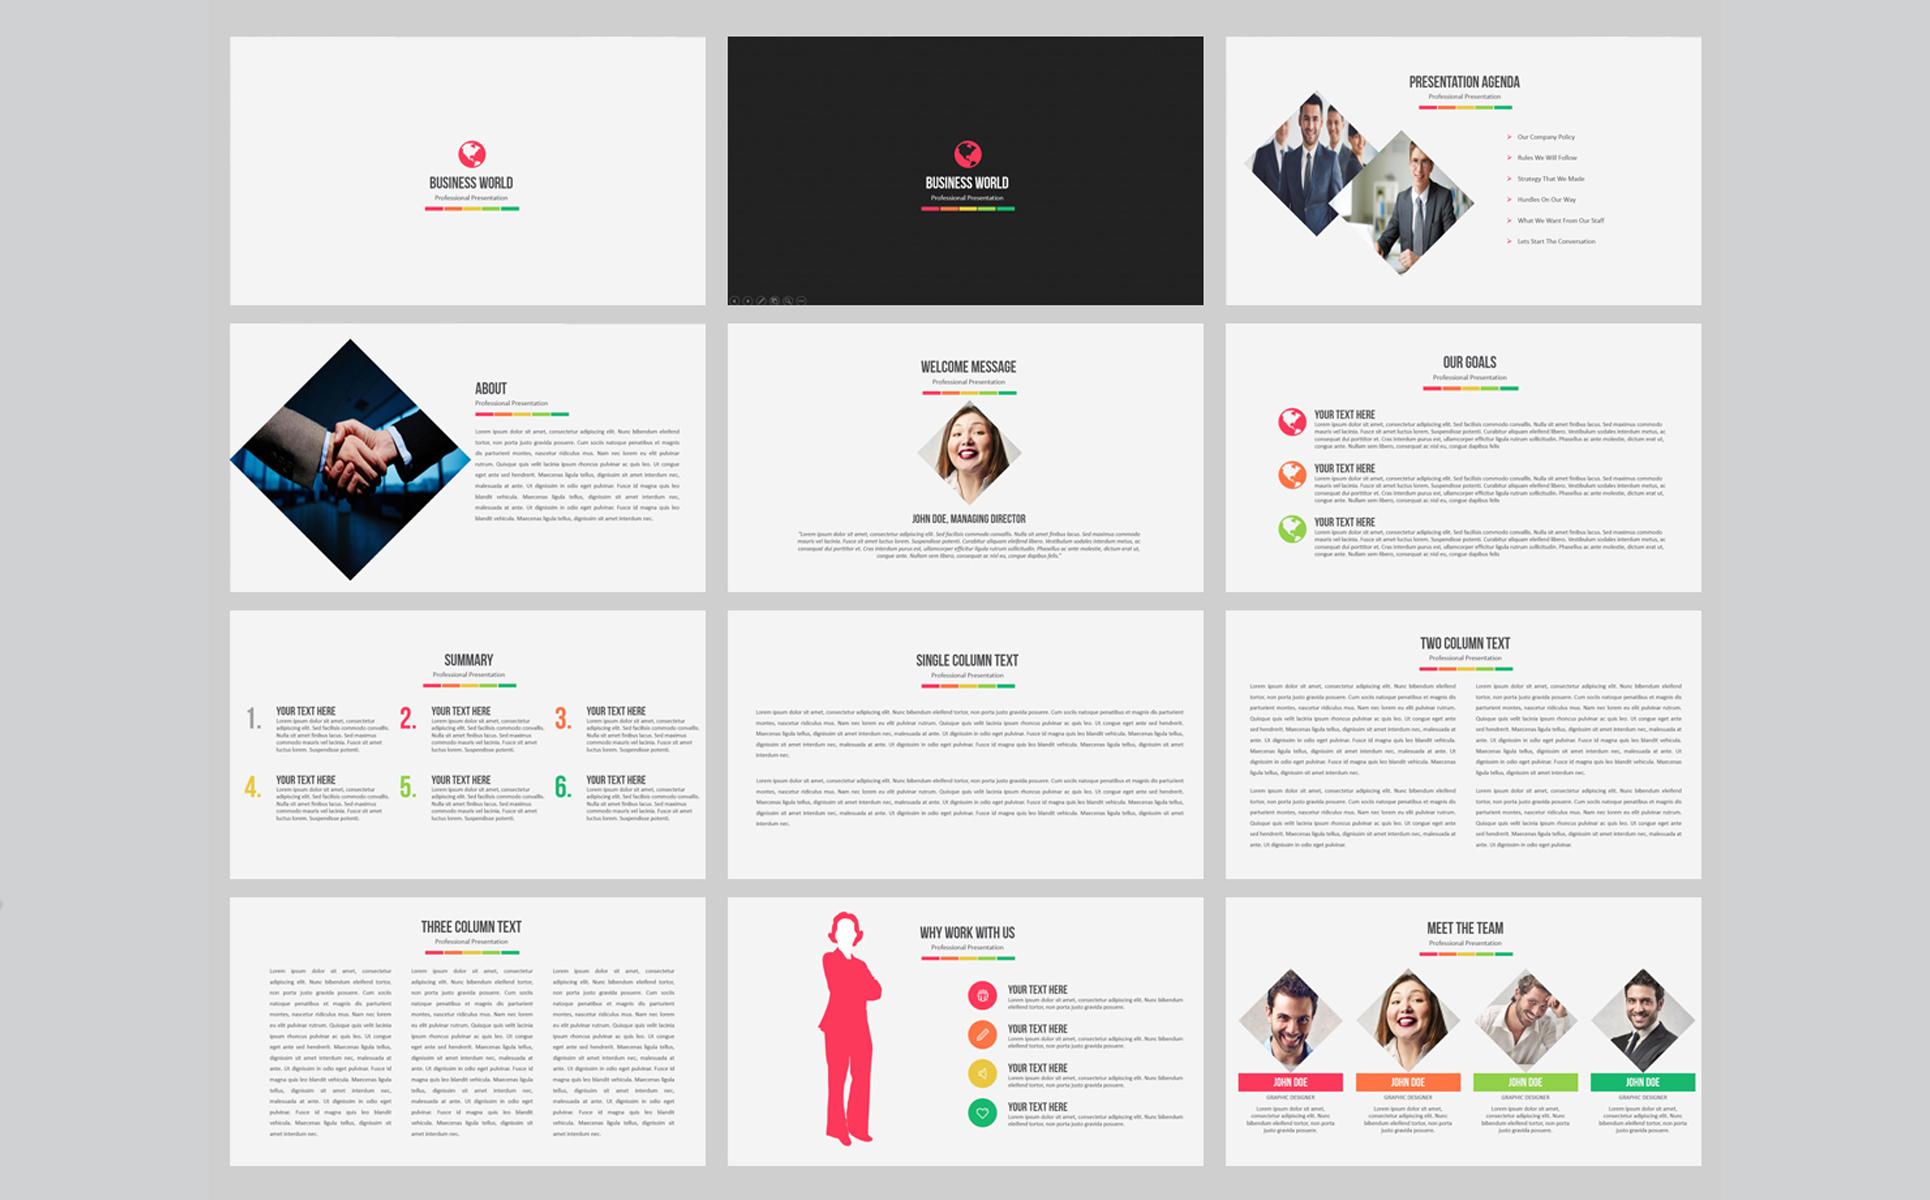 Business World PowerPoint Template